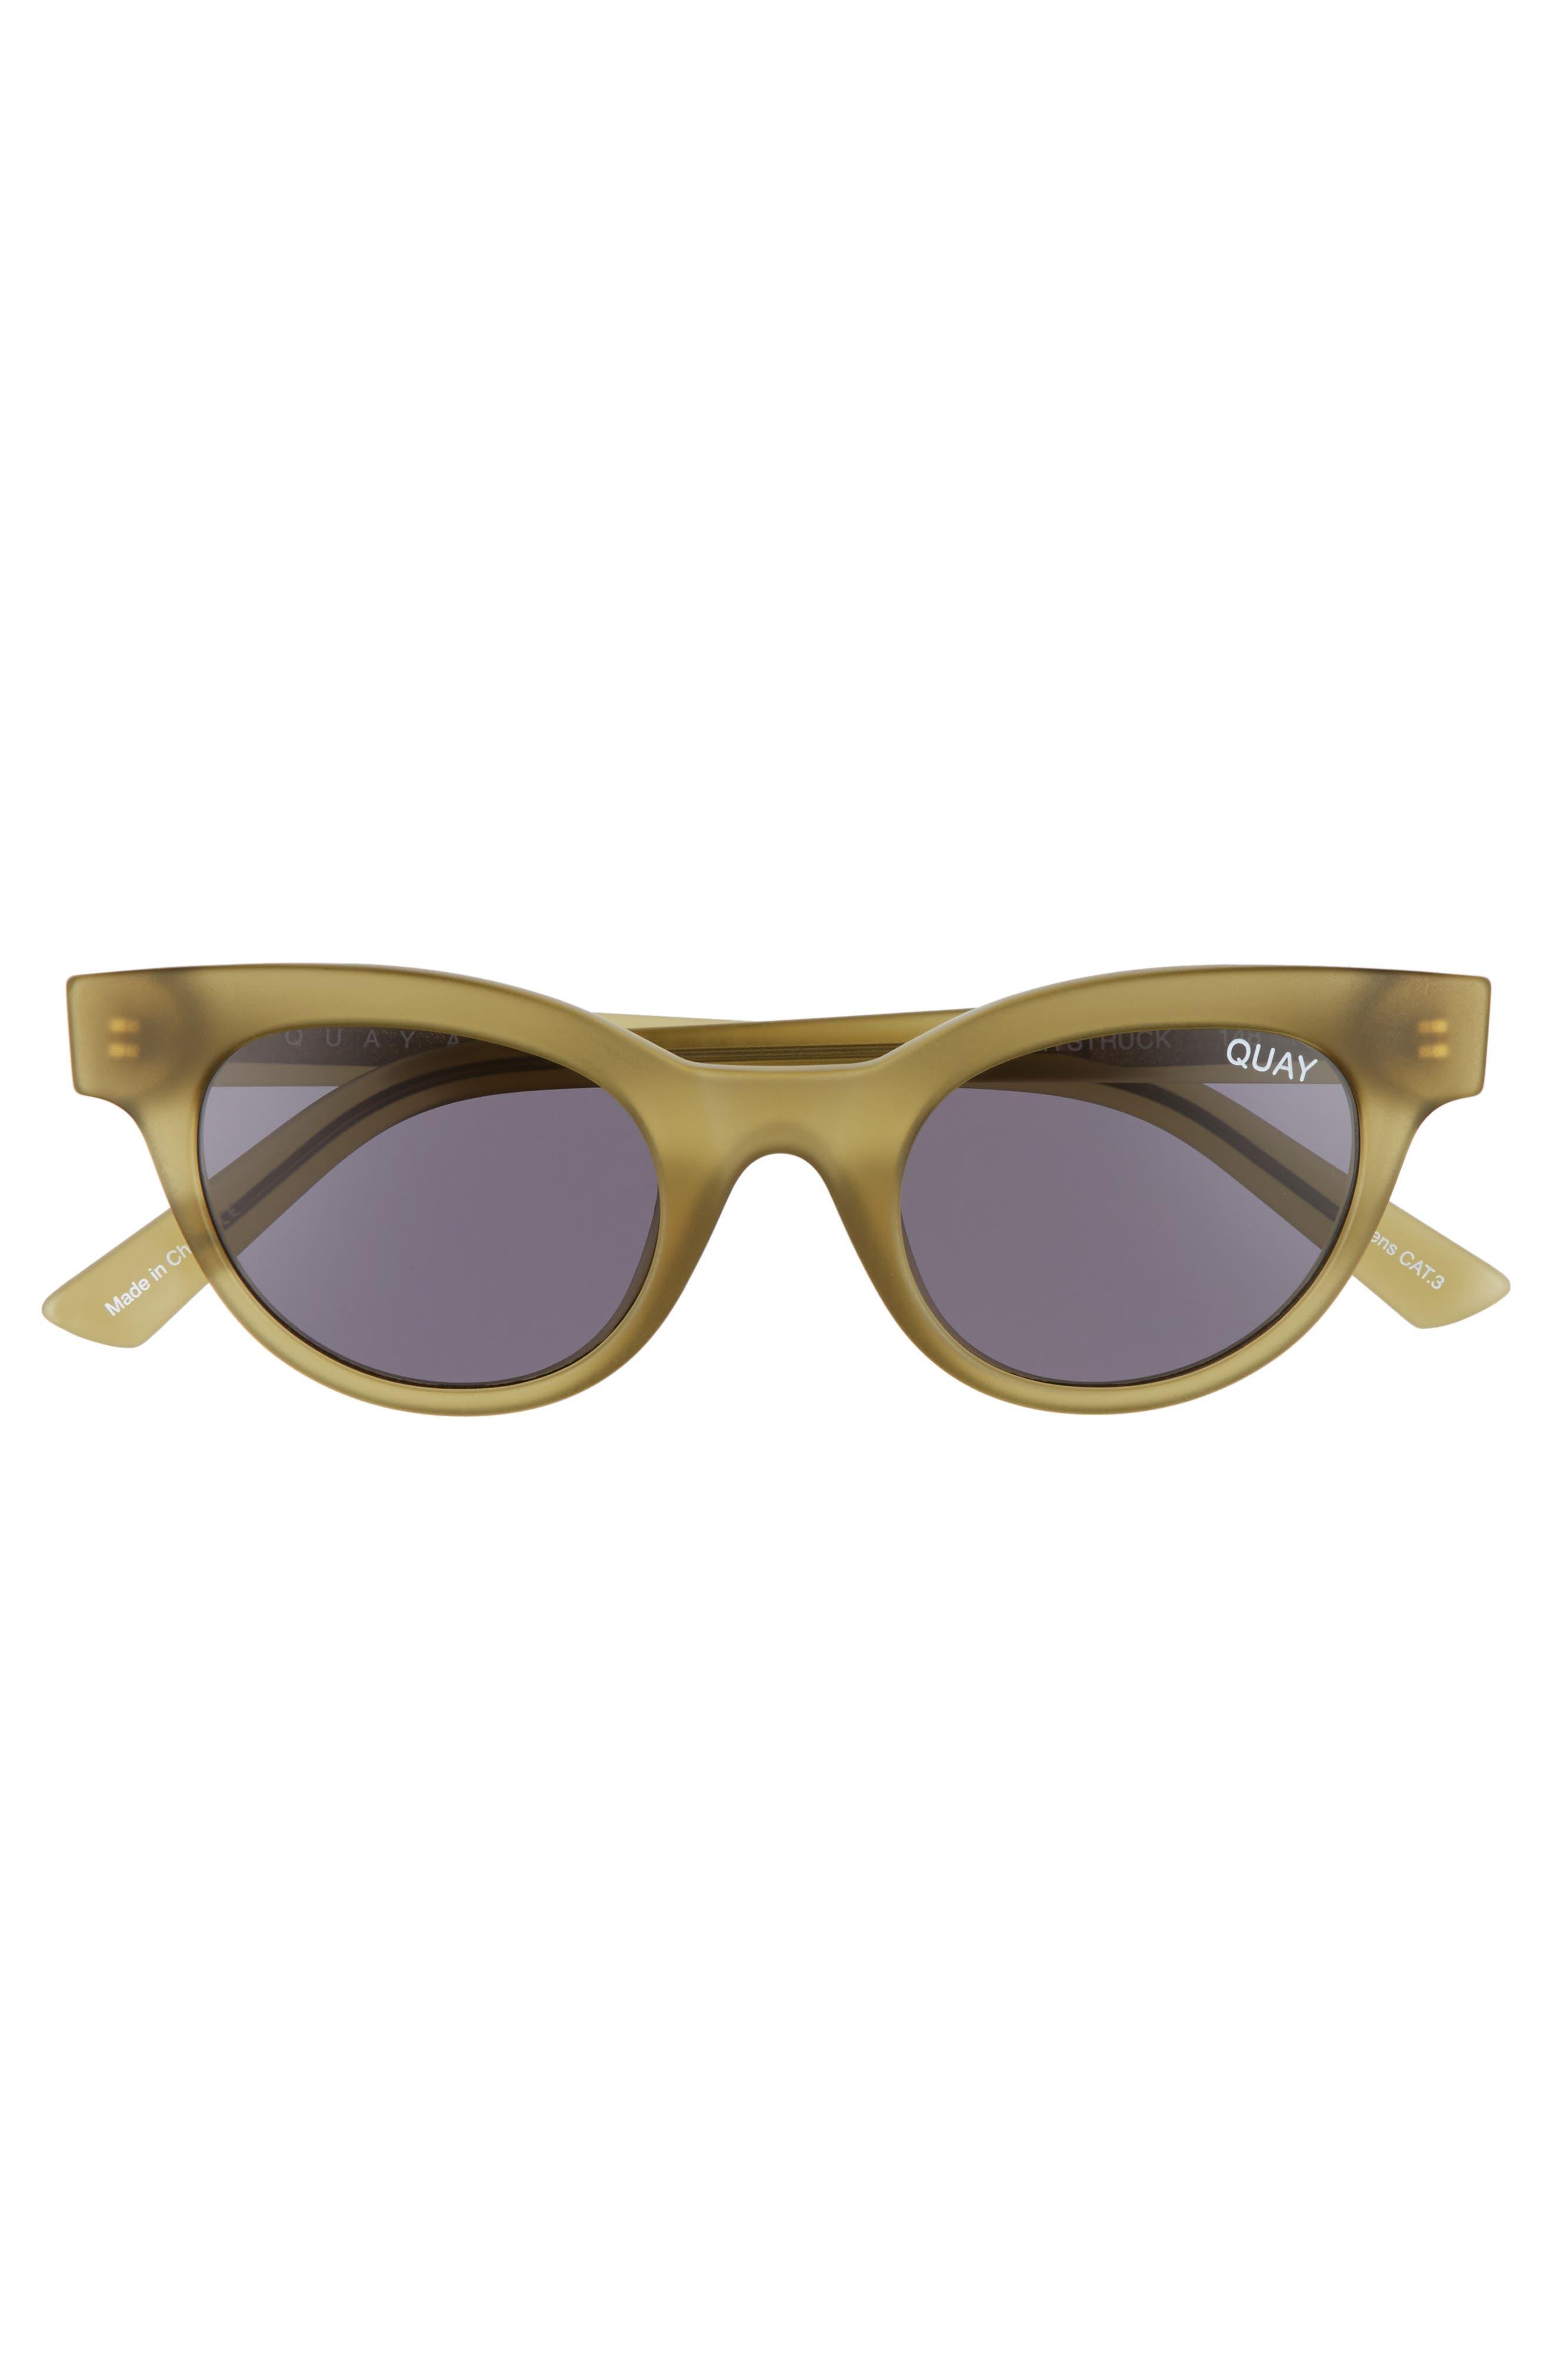 QUAY AUSTRALIA, Starstruck 48mm Cat Eye Sunglasses, Alternate thumbnail 3, color, 300